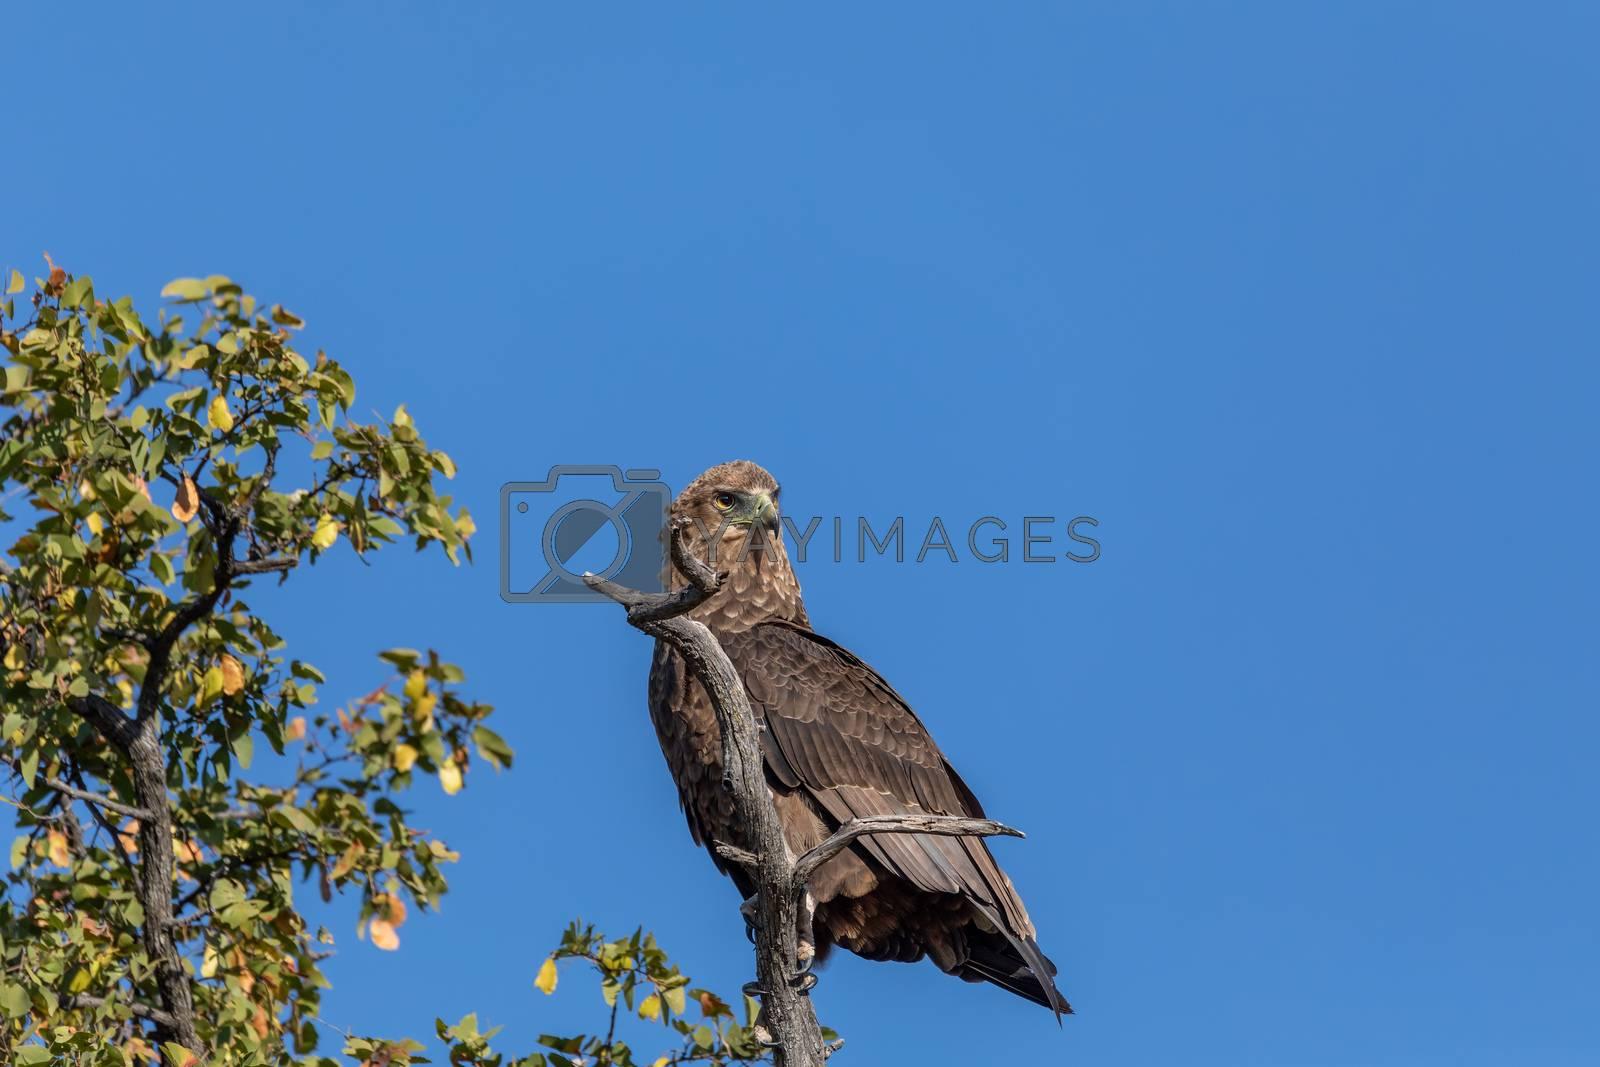 majestic tawny eagle (Aquila rapax), large bird of prey in natural habitat, Moremi game reserve, Botswana Africa safari wildlife